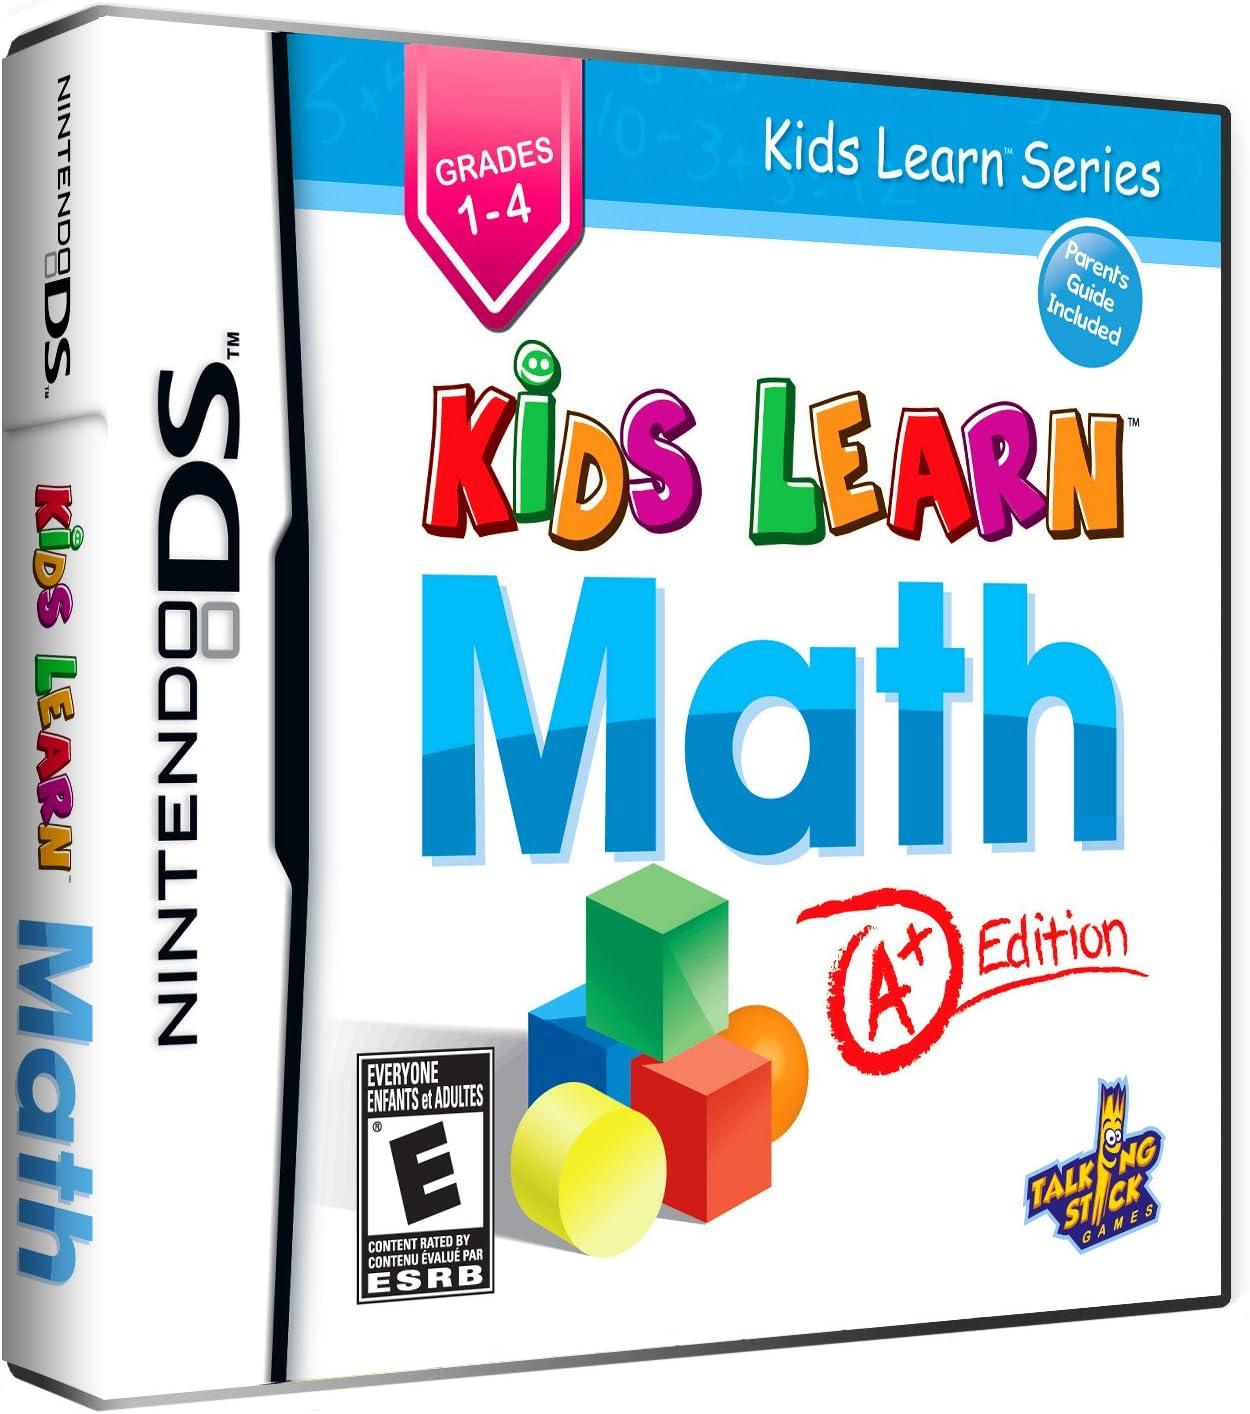 Amazon.com: Kids Learn Math: A+ Edition - Nintendo DS: American ...